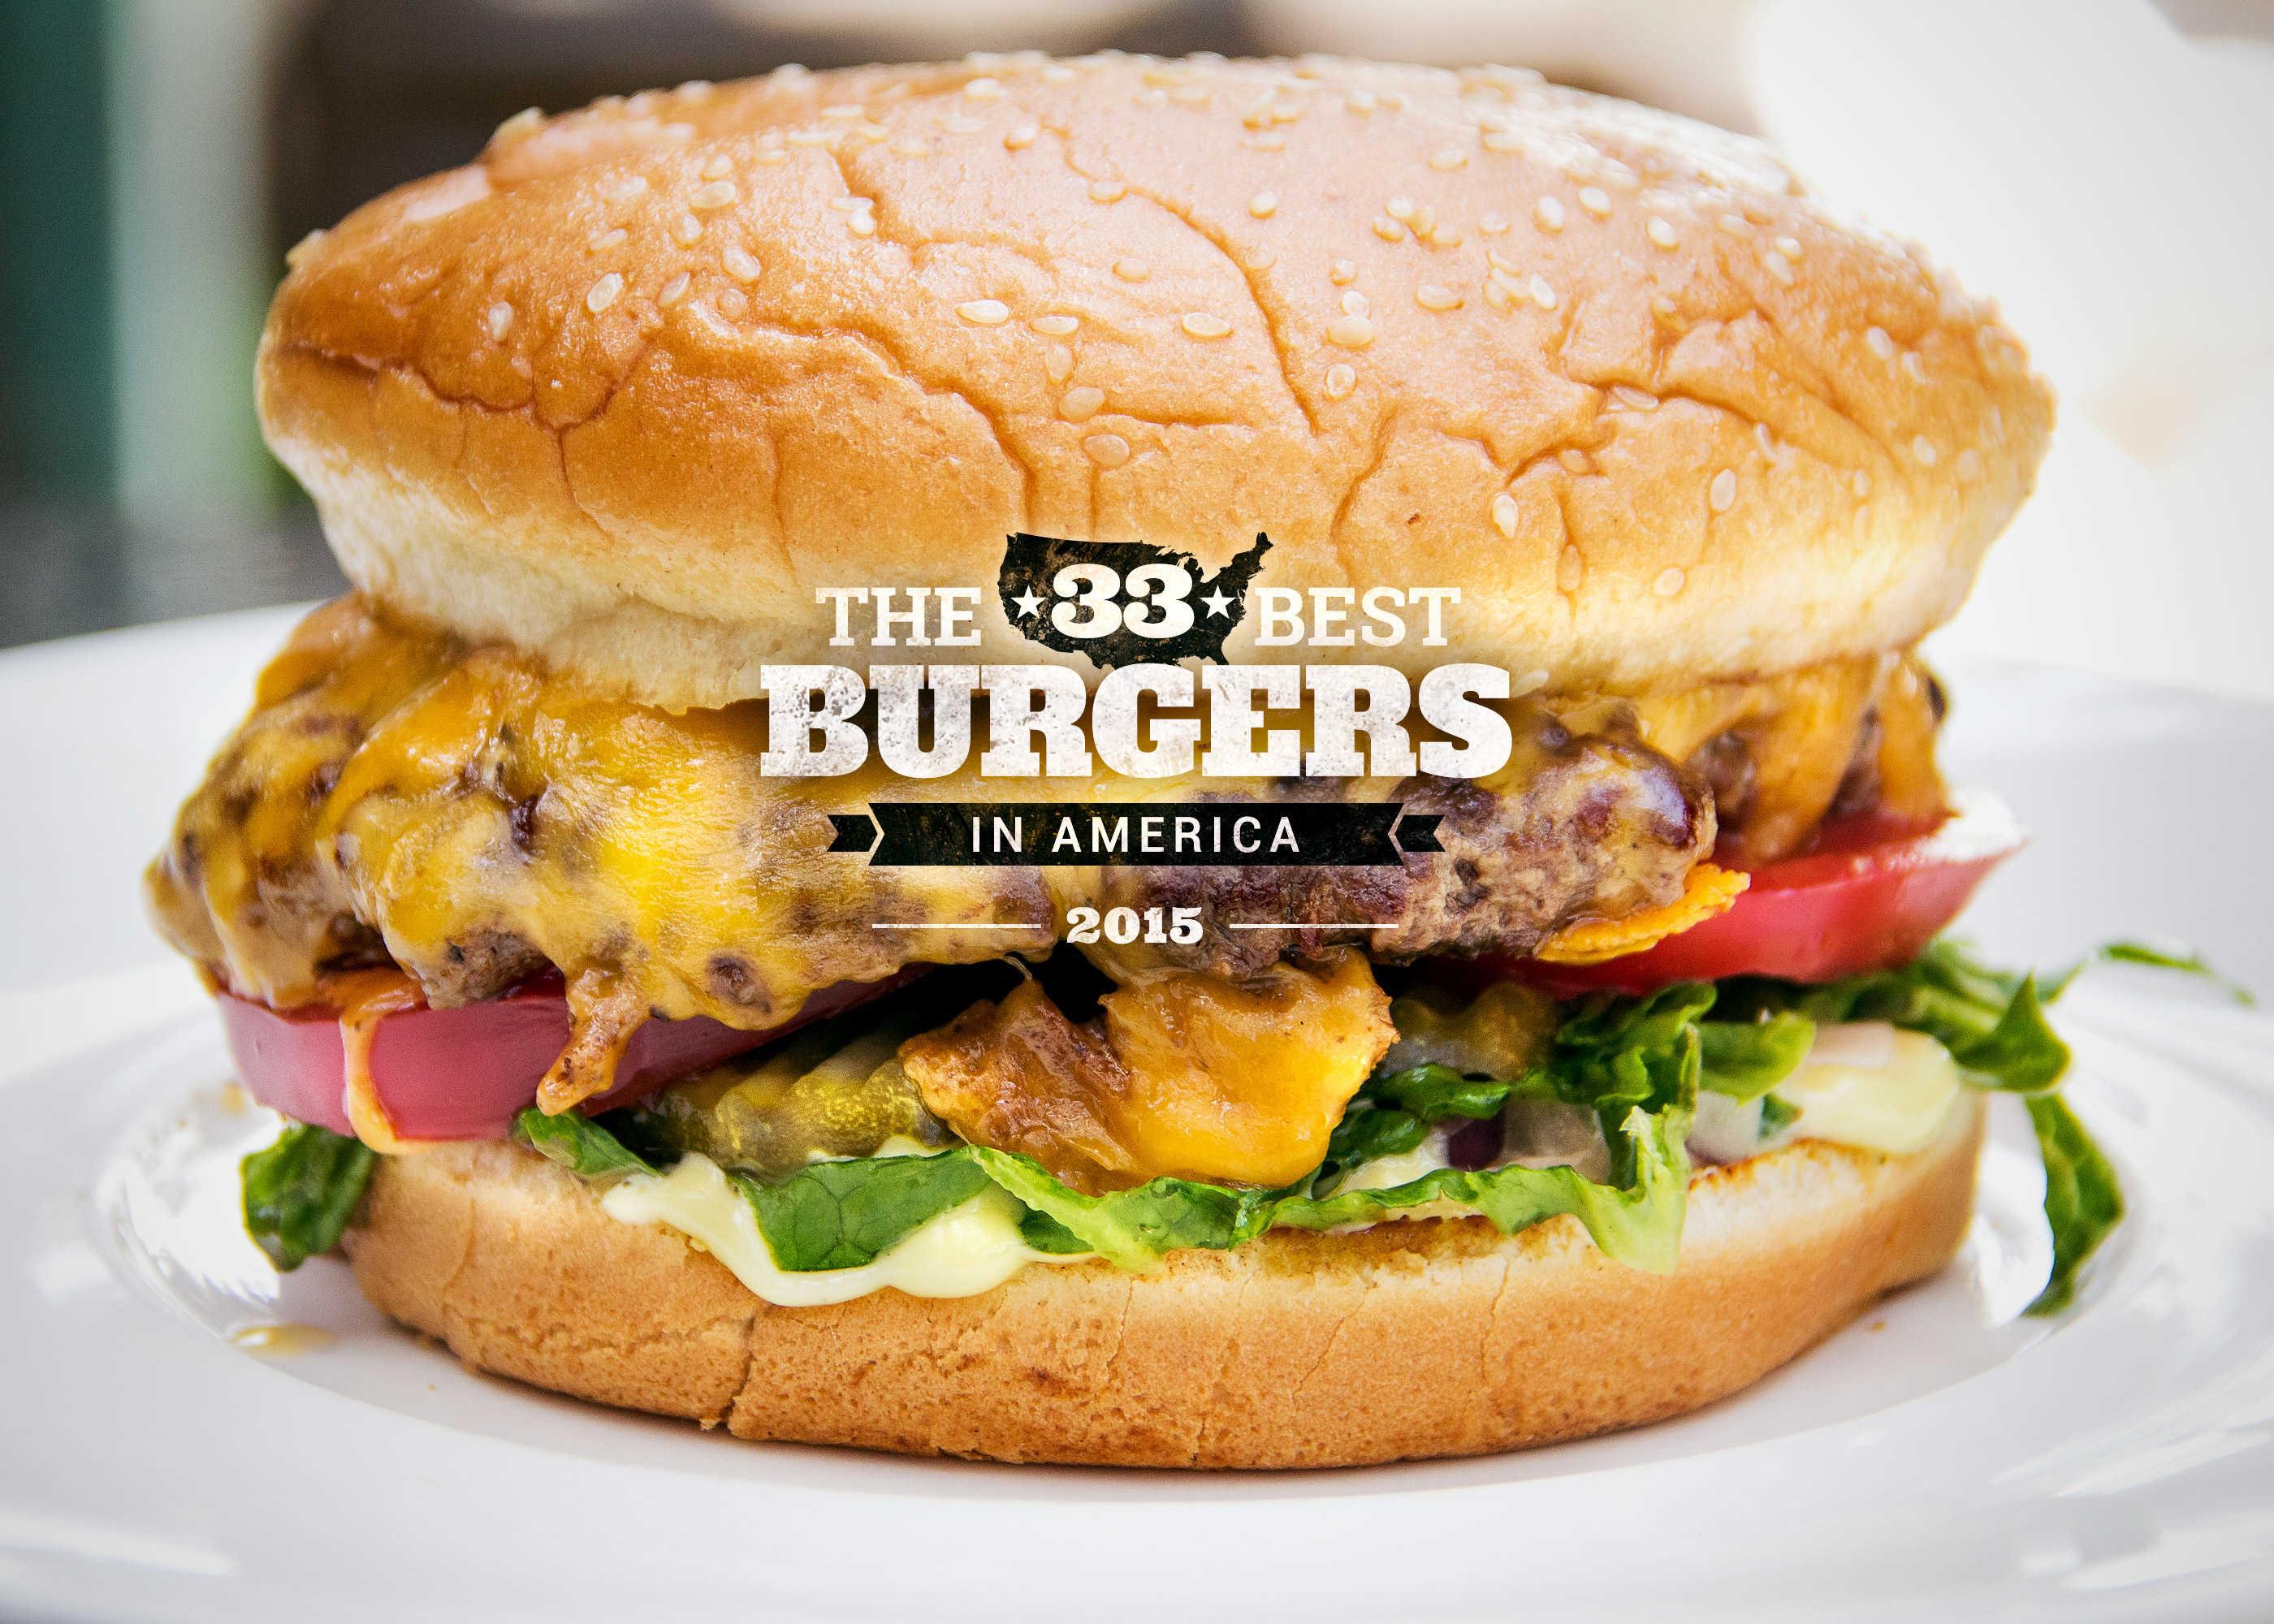 The 33 Best Burgers in America 2015